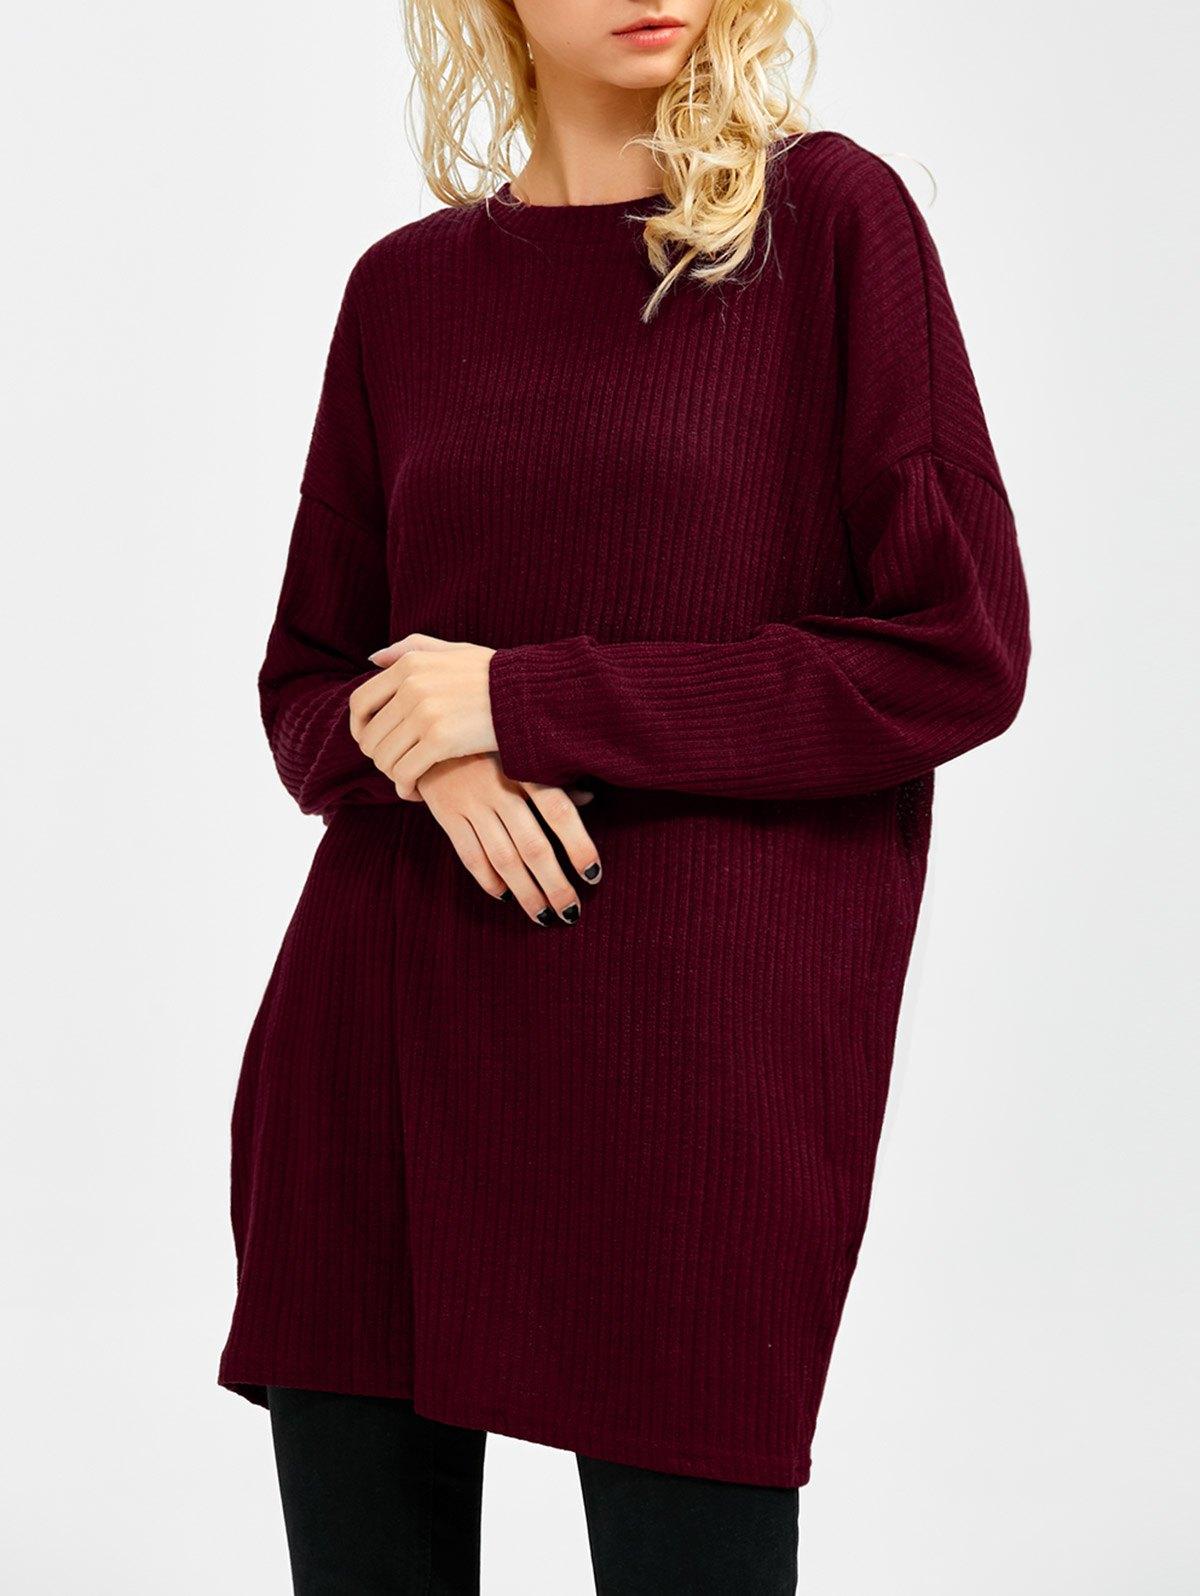 Skew Neck Long Sleeve Sweater